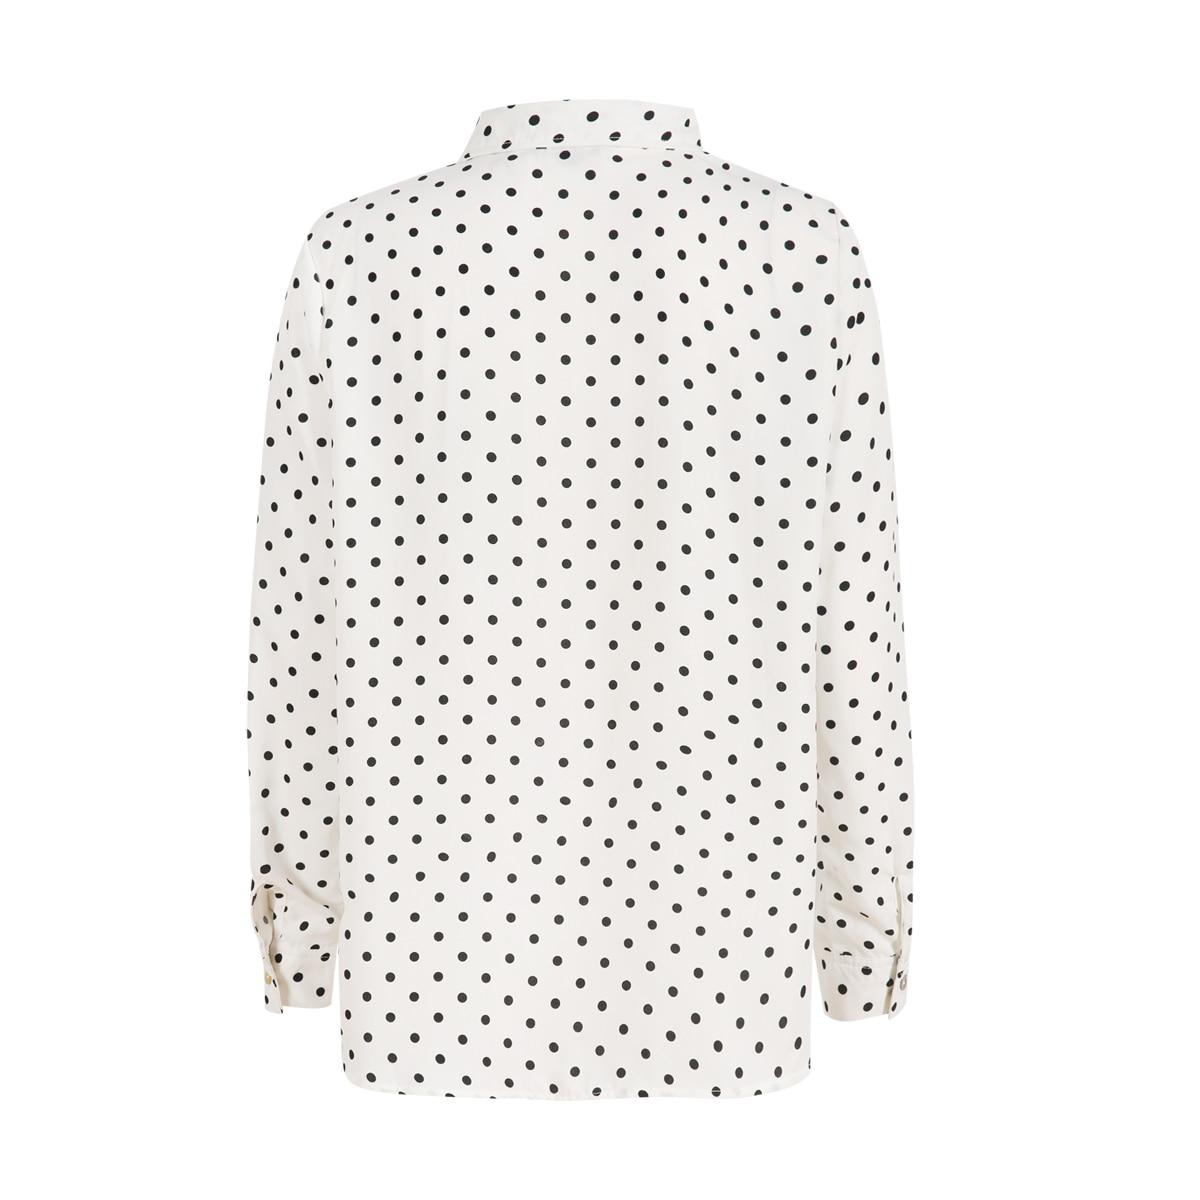 MCO New Basic Polka Dot Print Plus Size Women Blouse Casual Oversized Top Big Women Clothing Simple Spot Loose Shirt 5xl 6xl 7xl 1